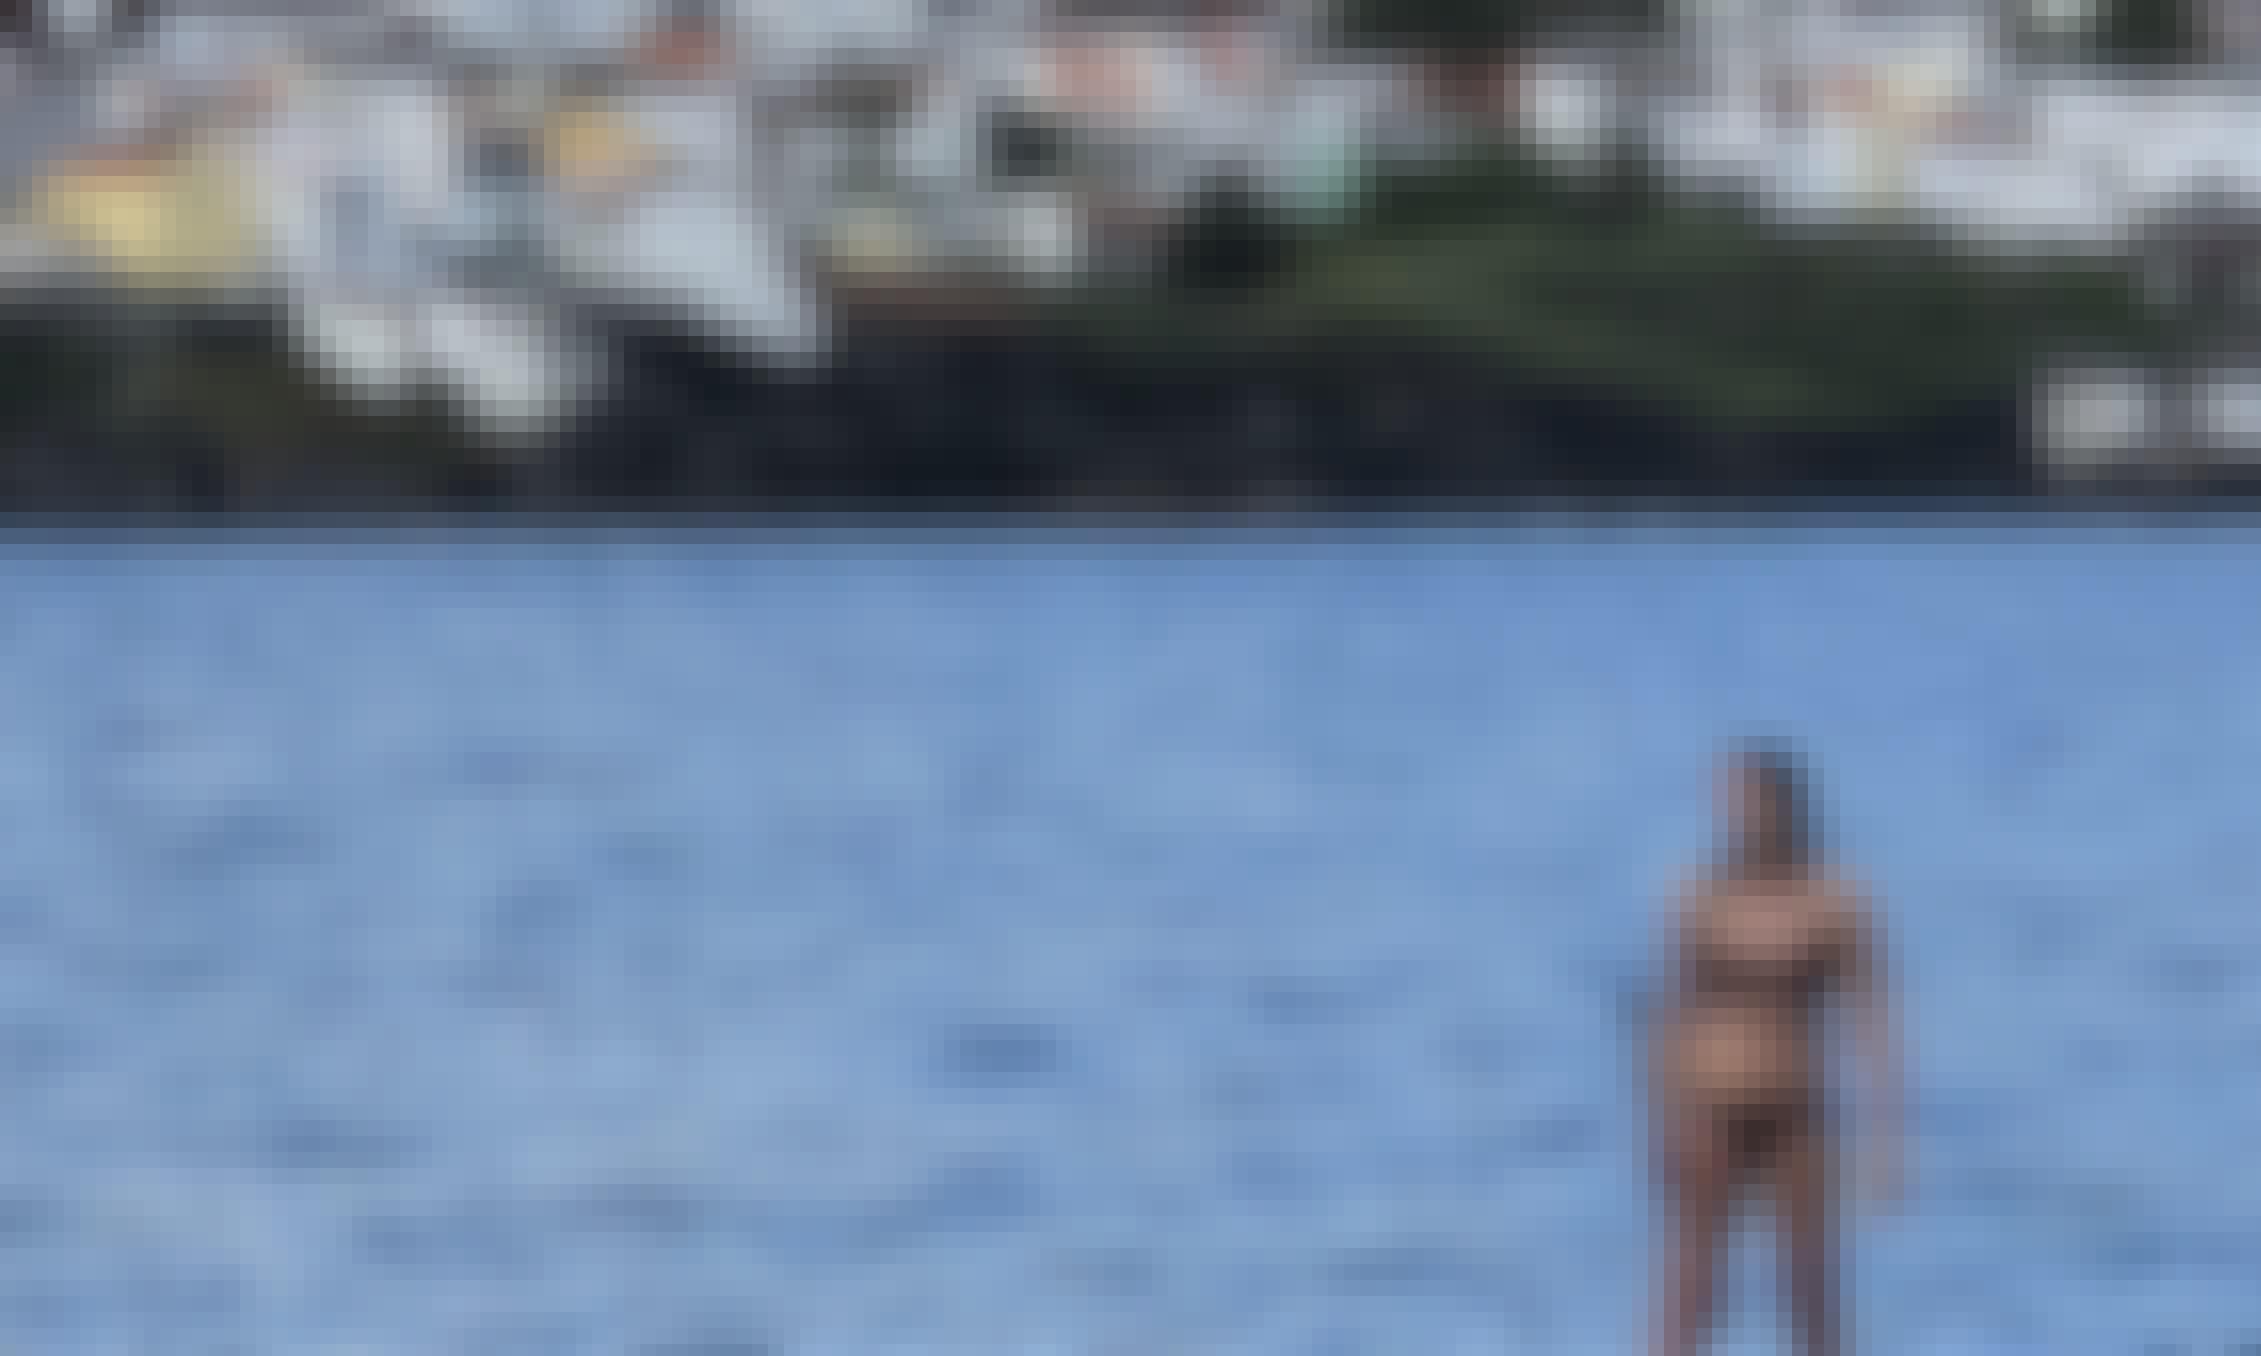 Stand Up Paddleboard Rental in Ponta Delgada, Açores